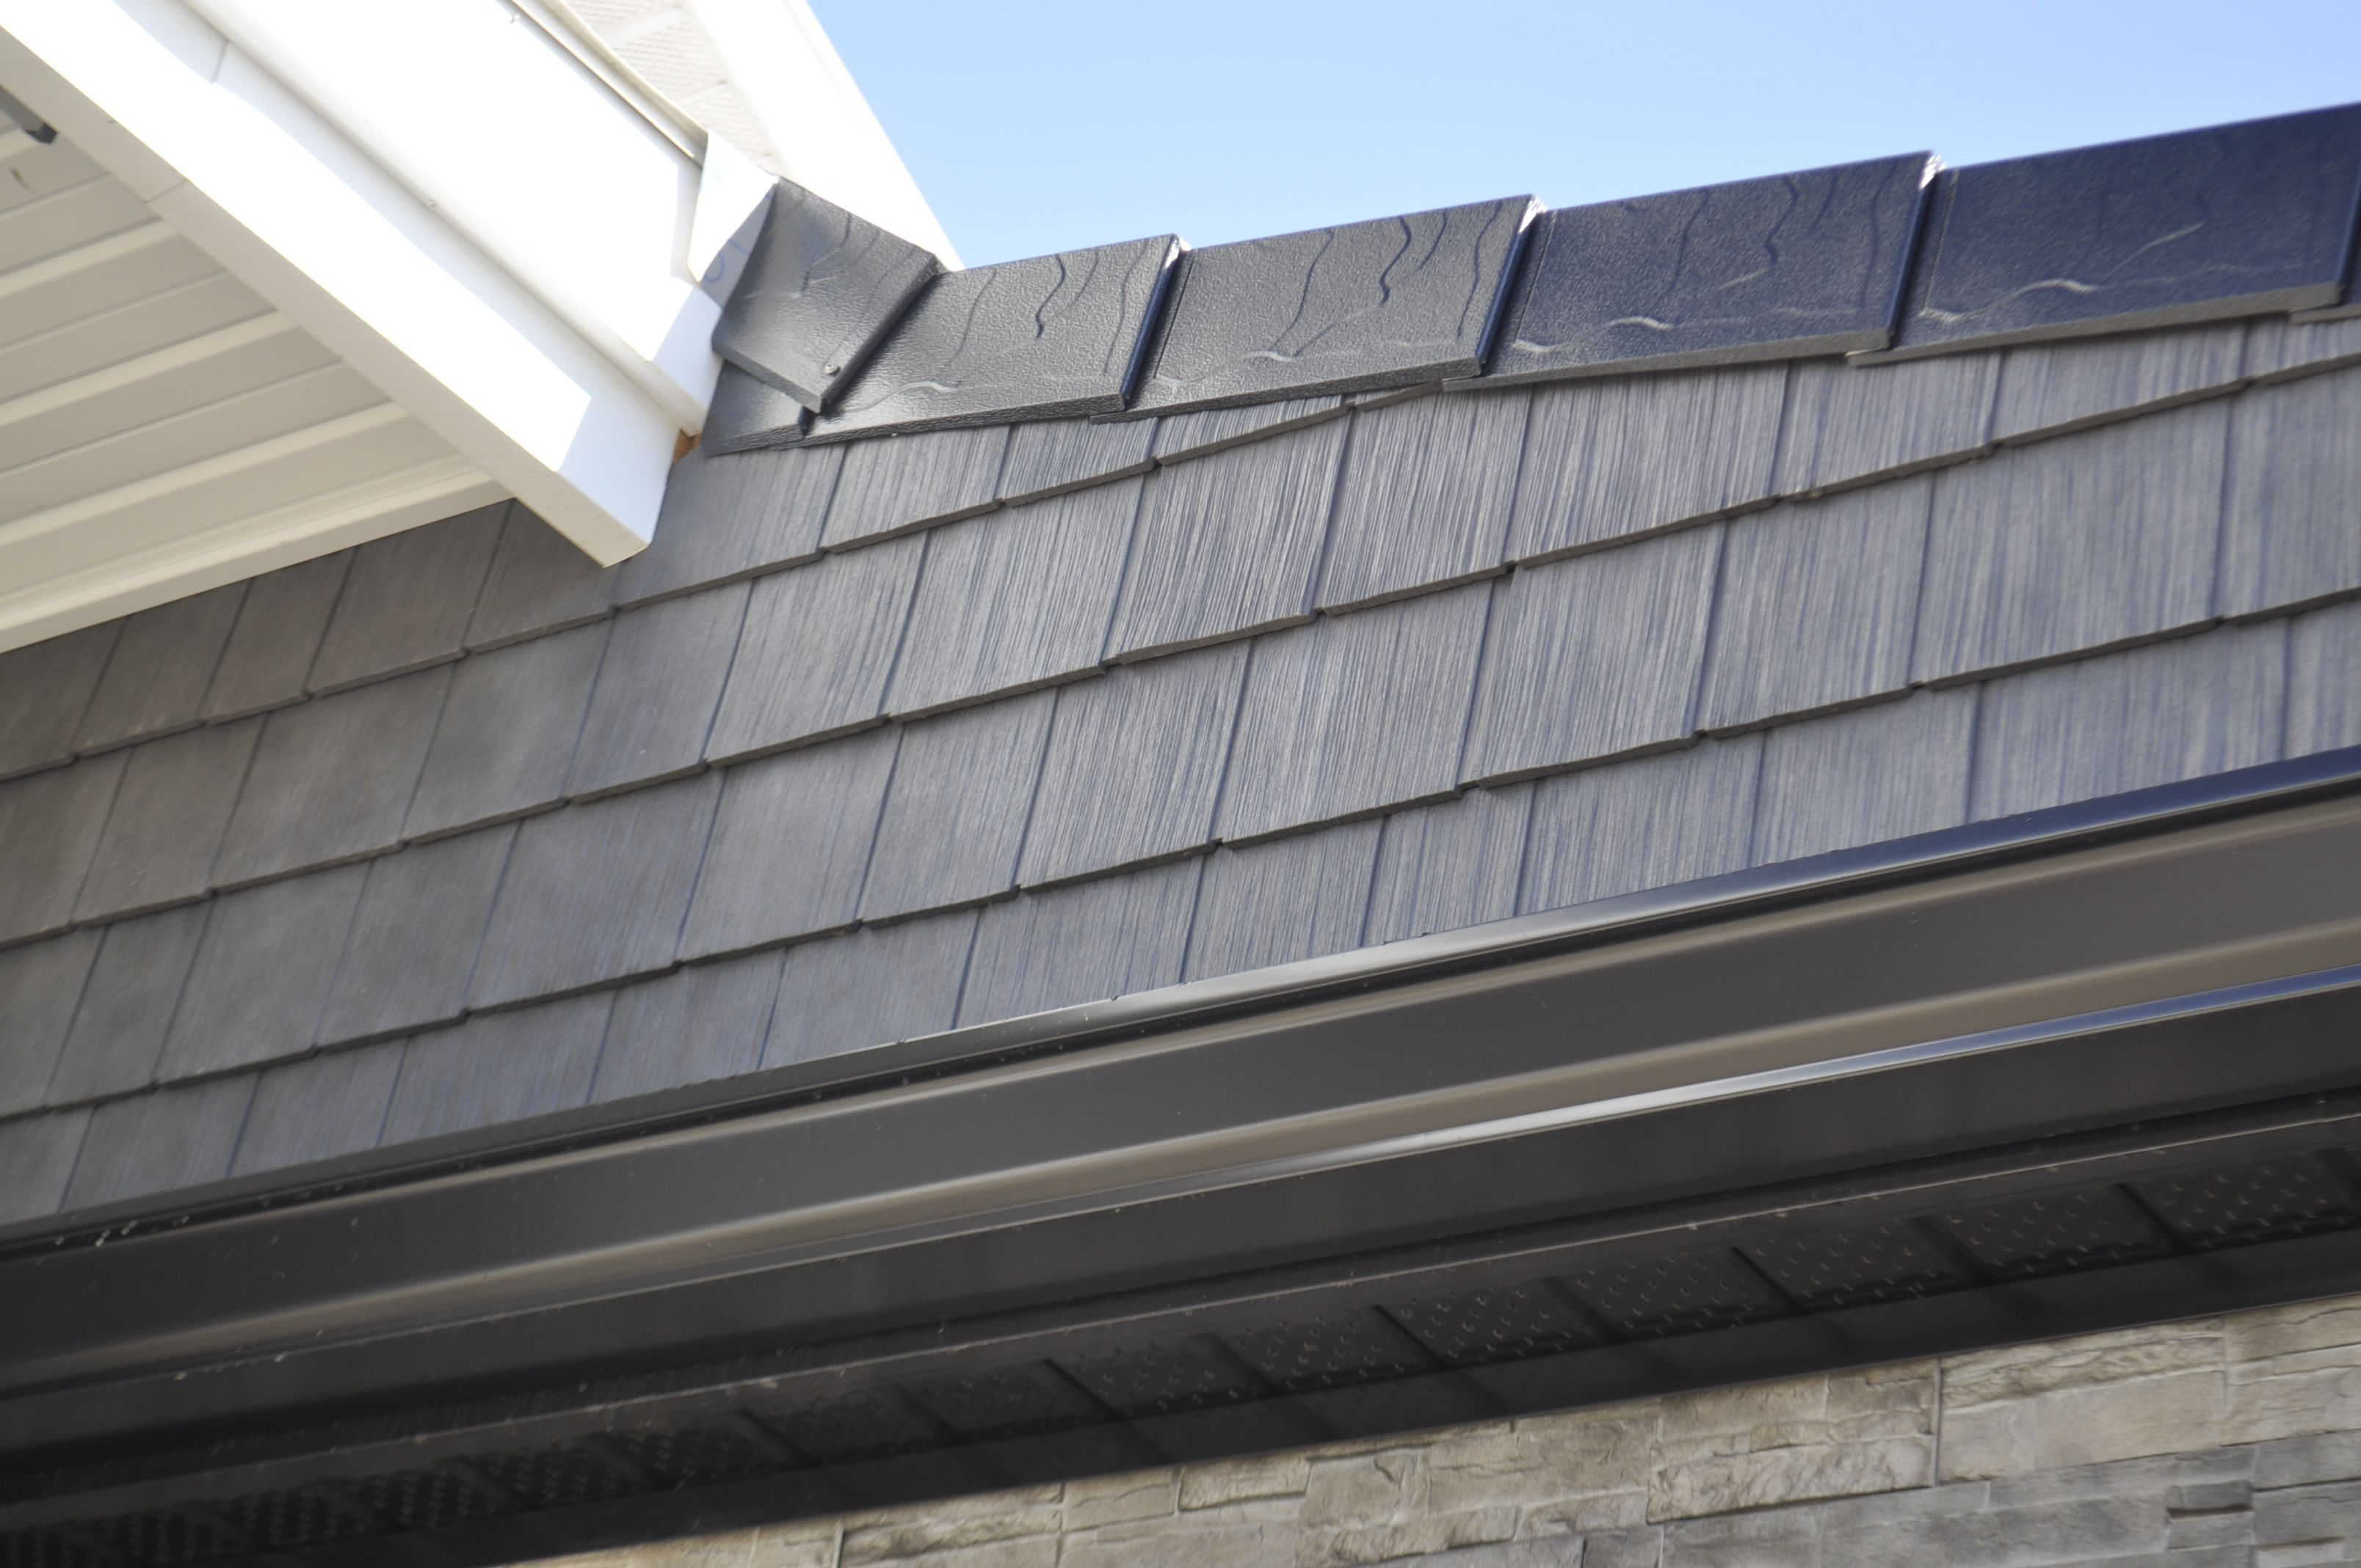 Novik Rs8 Shake With Buchner Manufacturing Aluminum Slate Shingles Metal Shingles Aluminum Shingles Slate Shingles